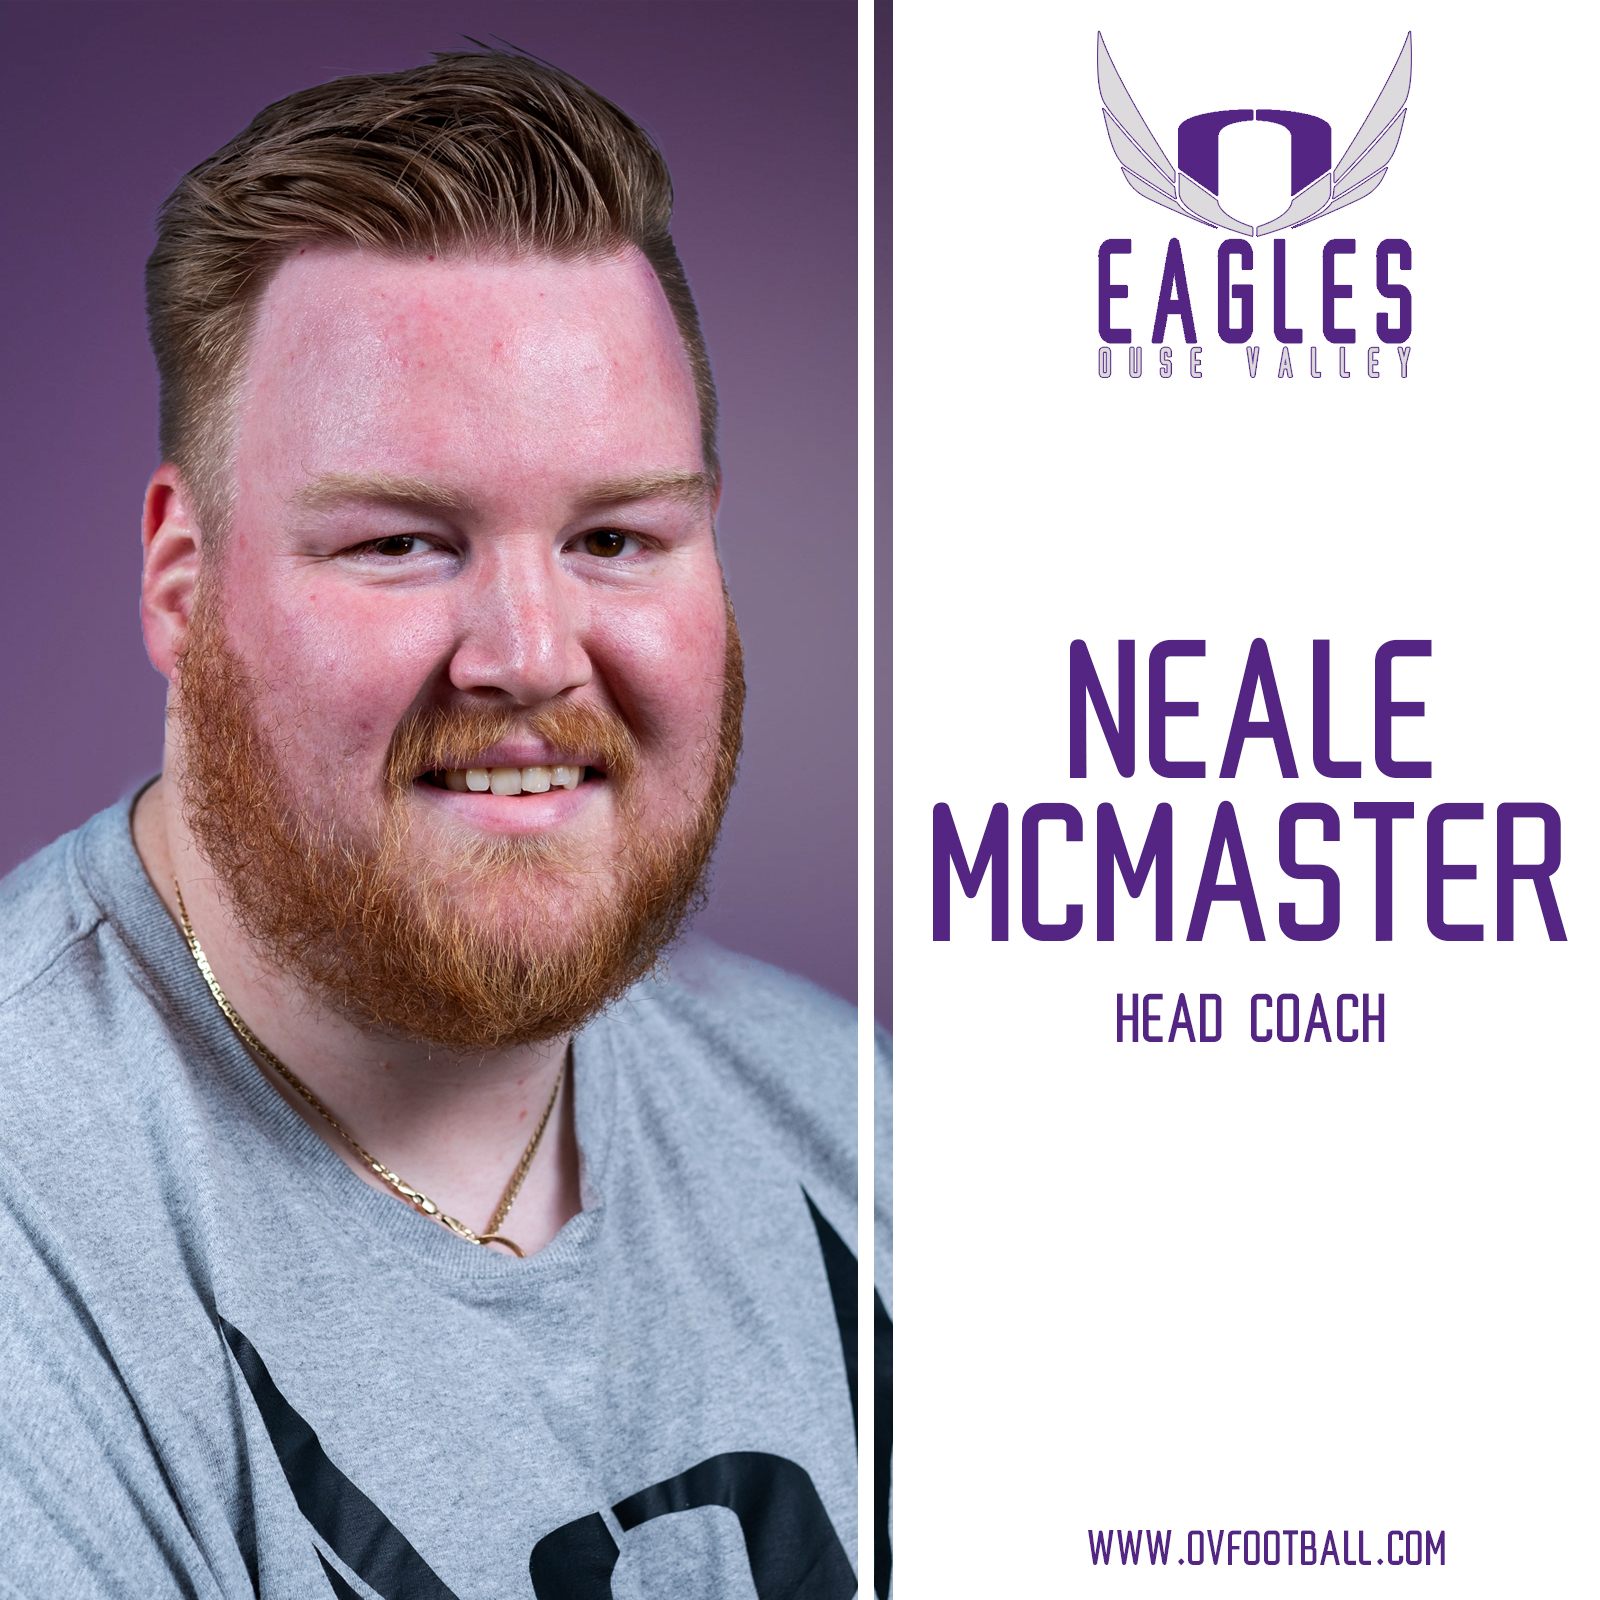 Neale-McMaster-HC.jpg